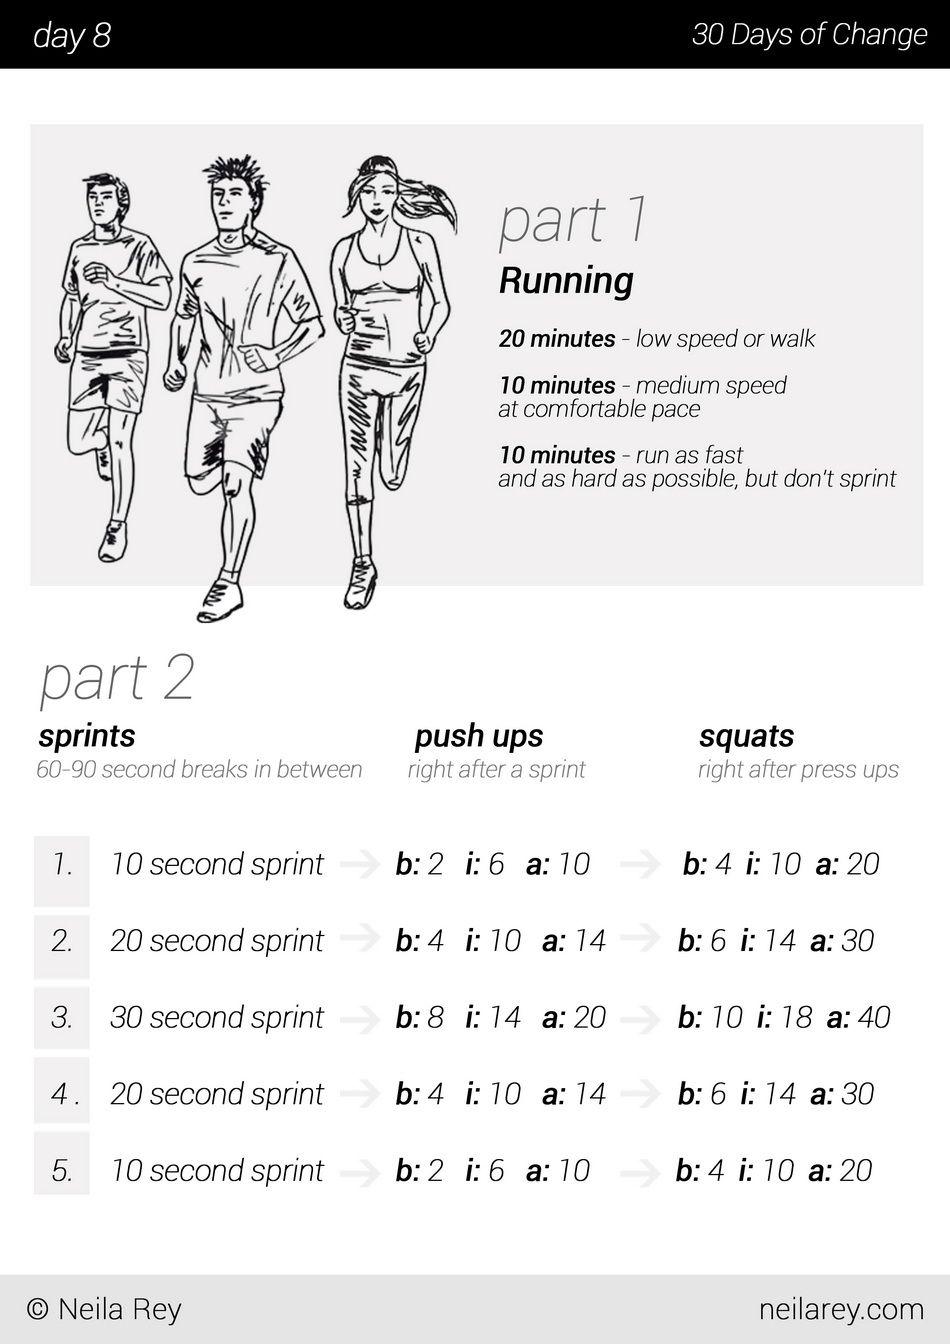 No equipment 30 day workout program - Imgur | 5K | Pinterest ...